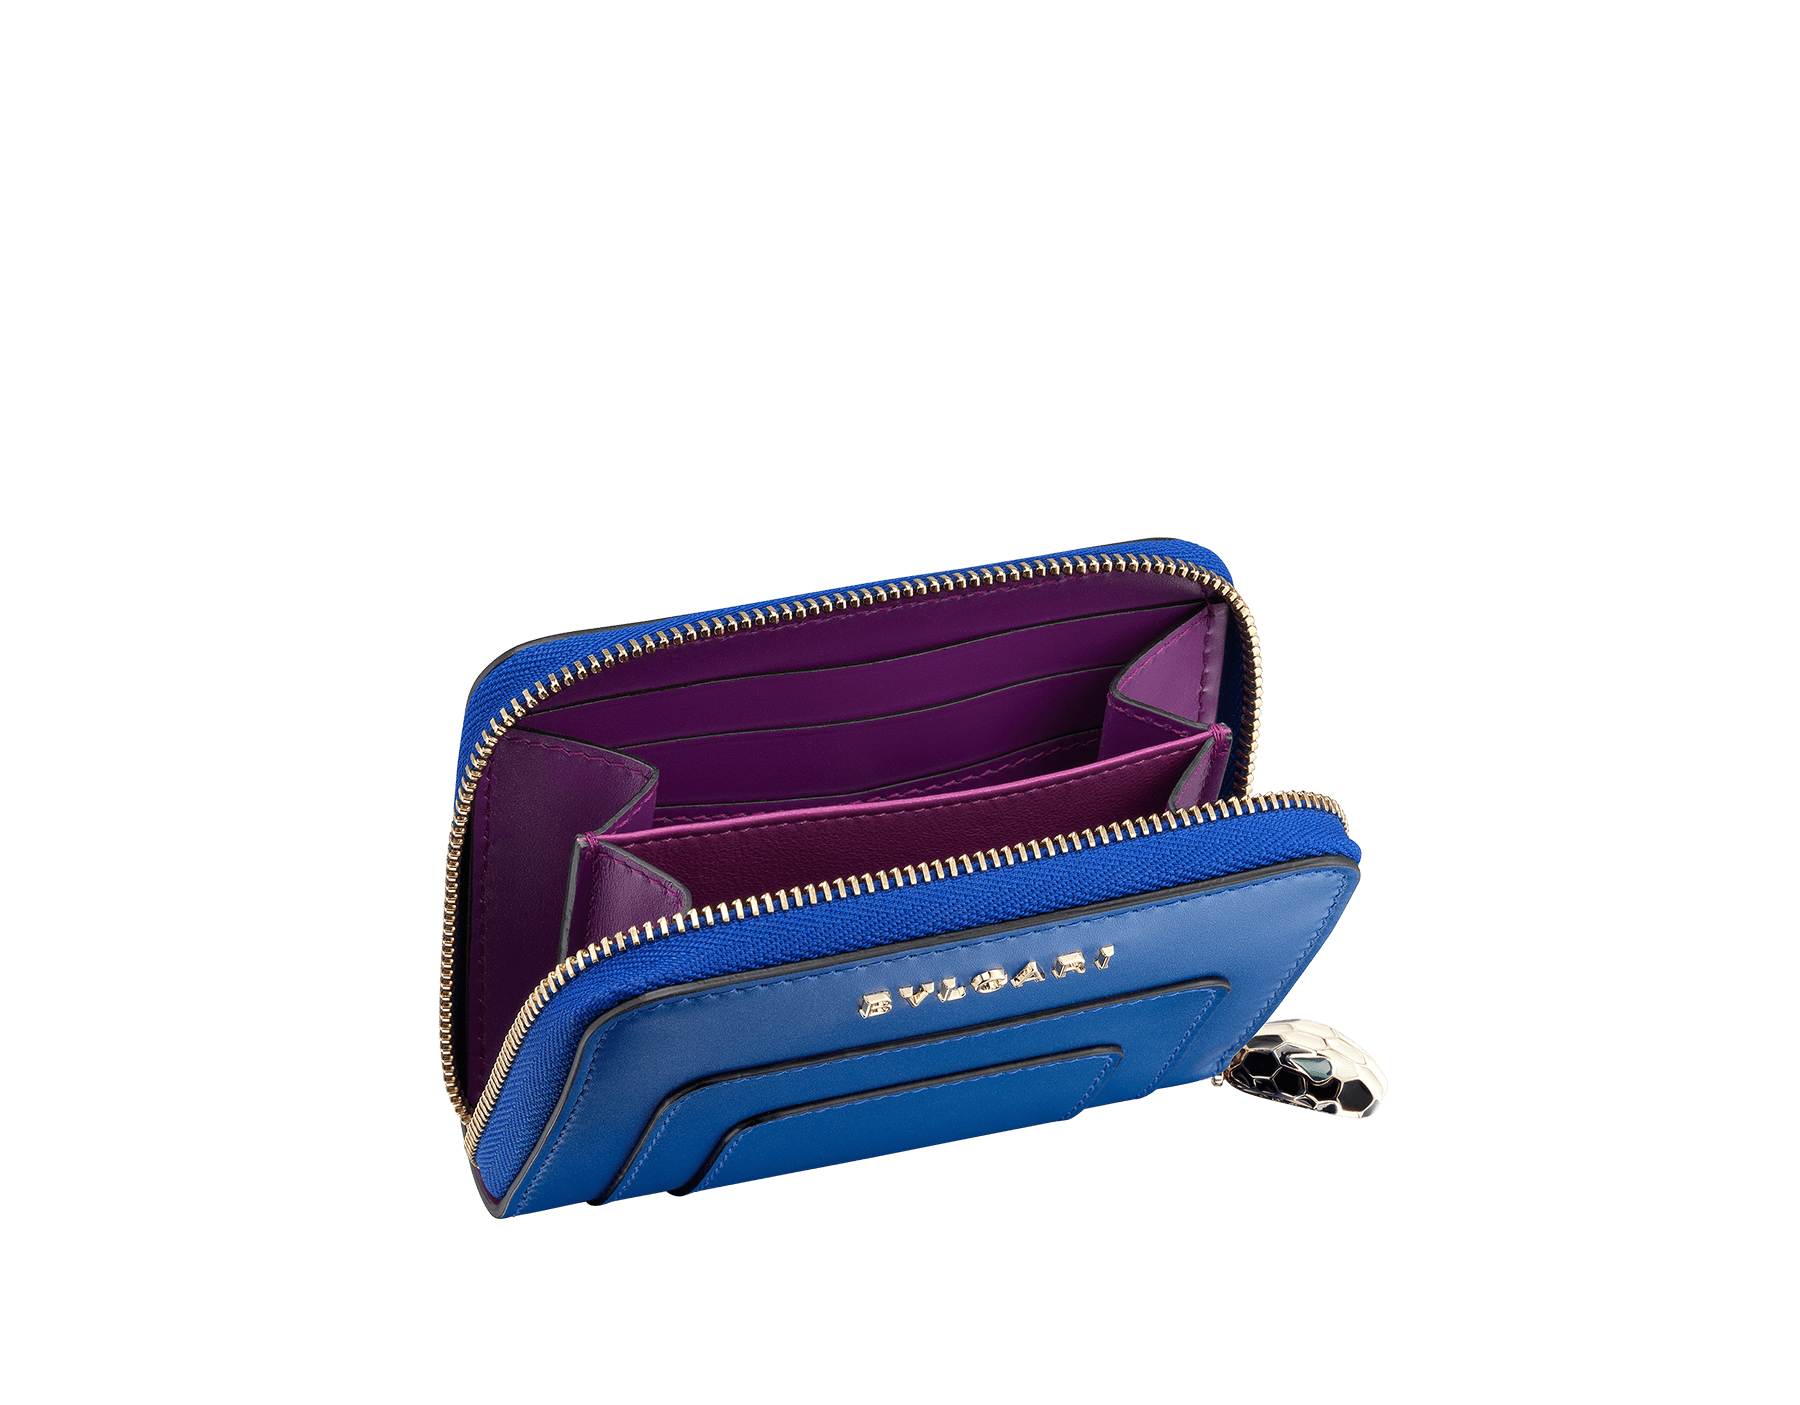 Serpenti Forever 鈷藍碧璽色和水晶紫菀色小牛皮迷你拉鍊皮夾。經典蛇頭拉鍊飾以黑色和白色琺瑯,蛇眼飾以綠色琺瑯。 287152 image 2